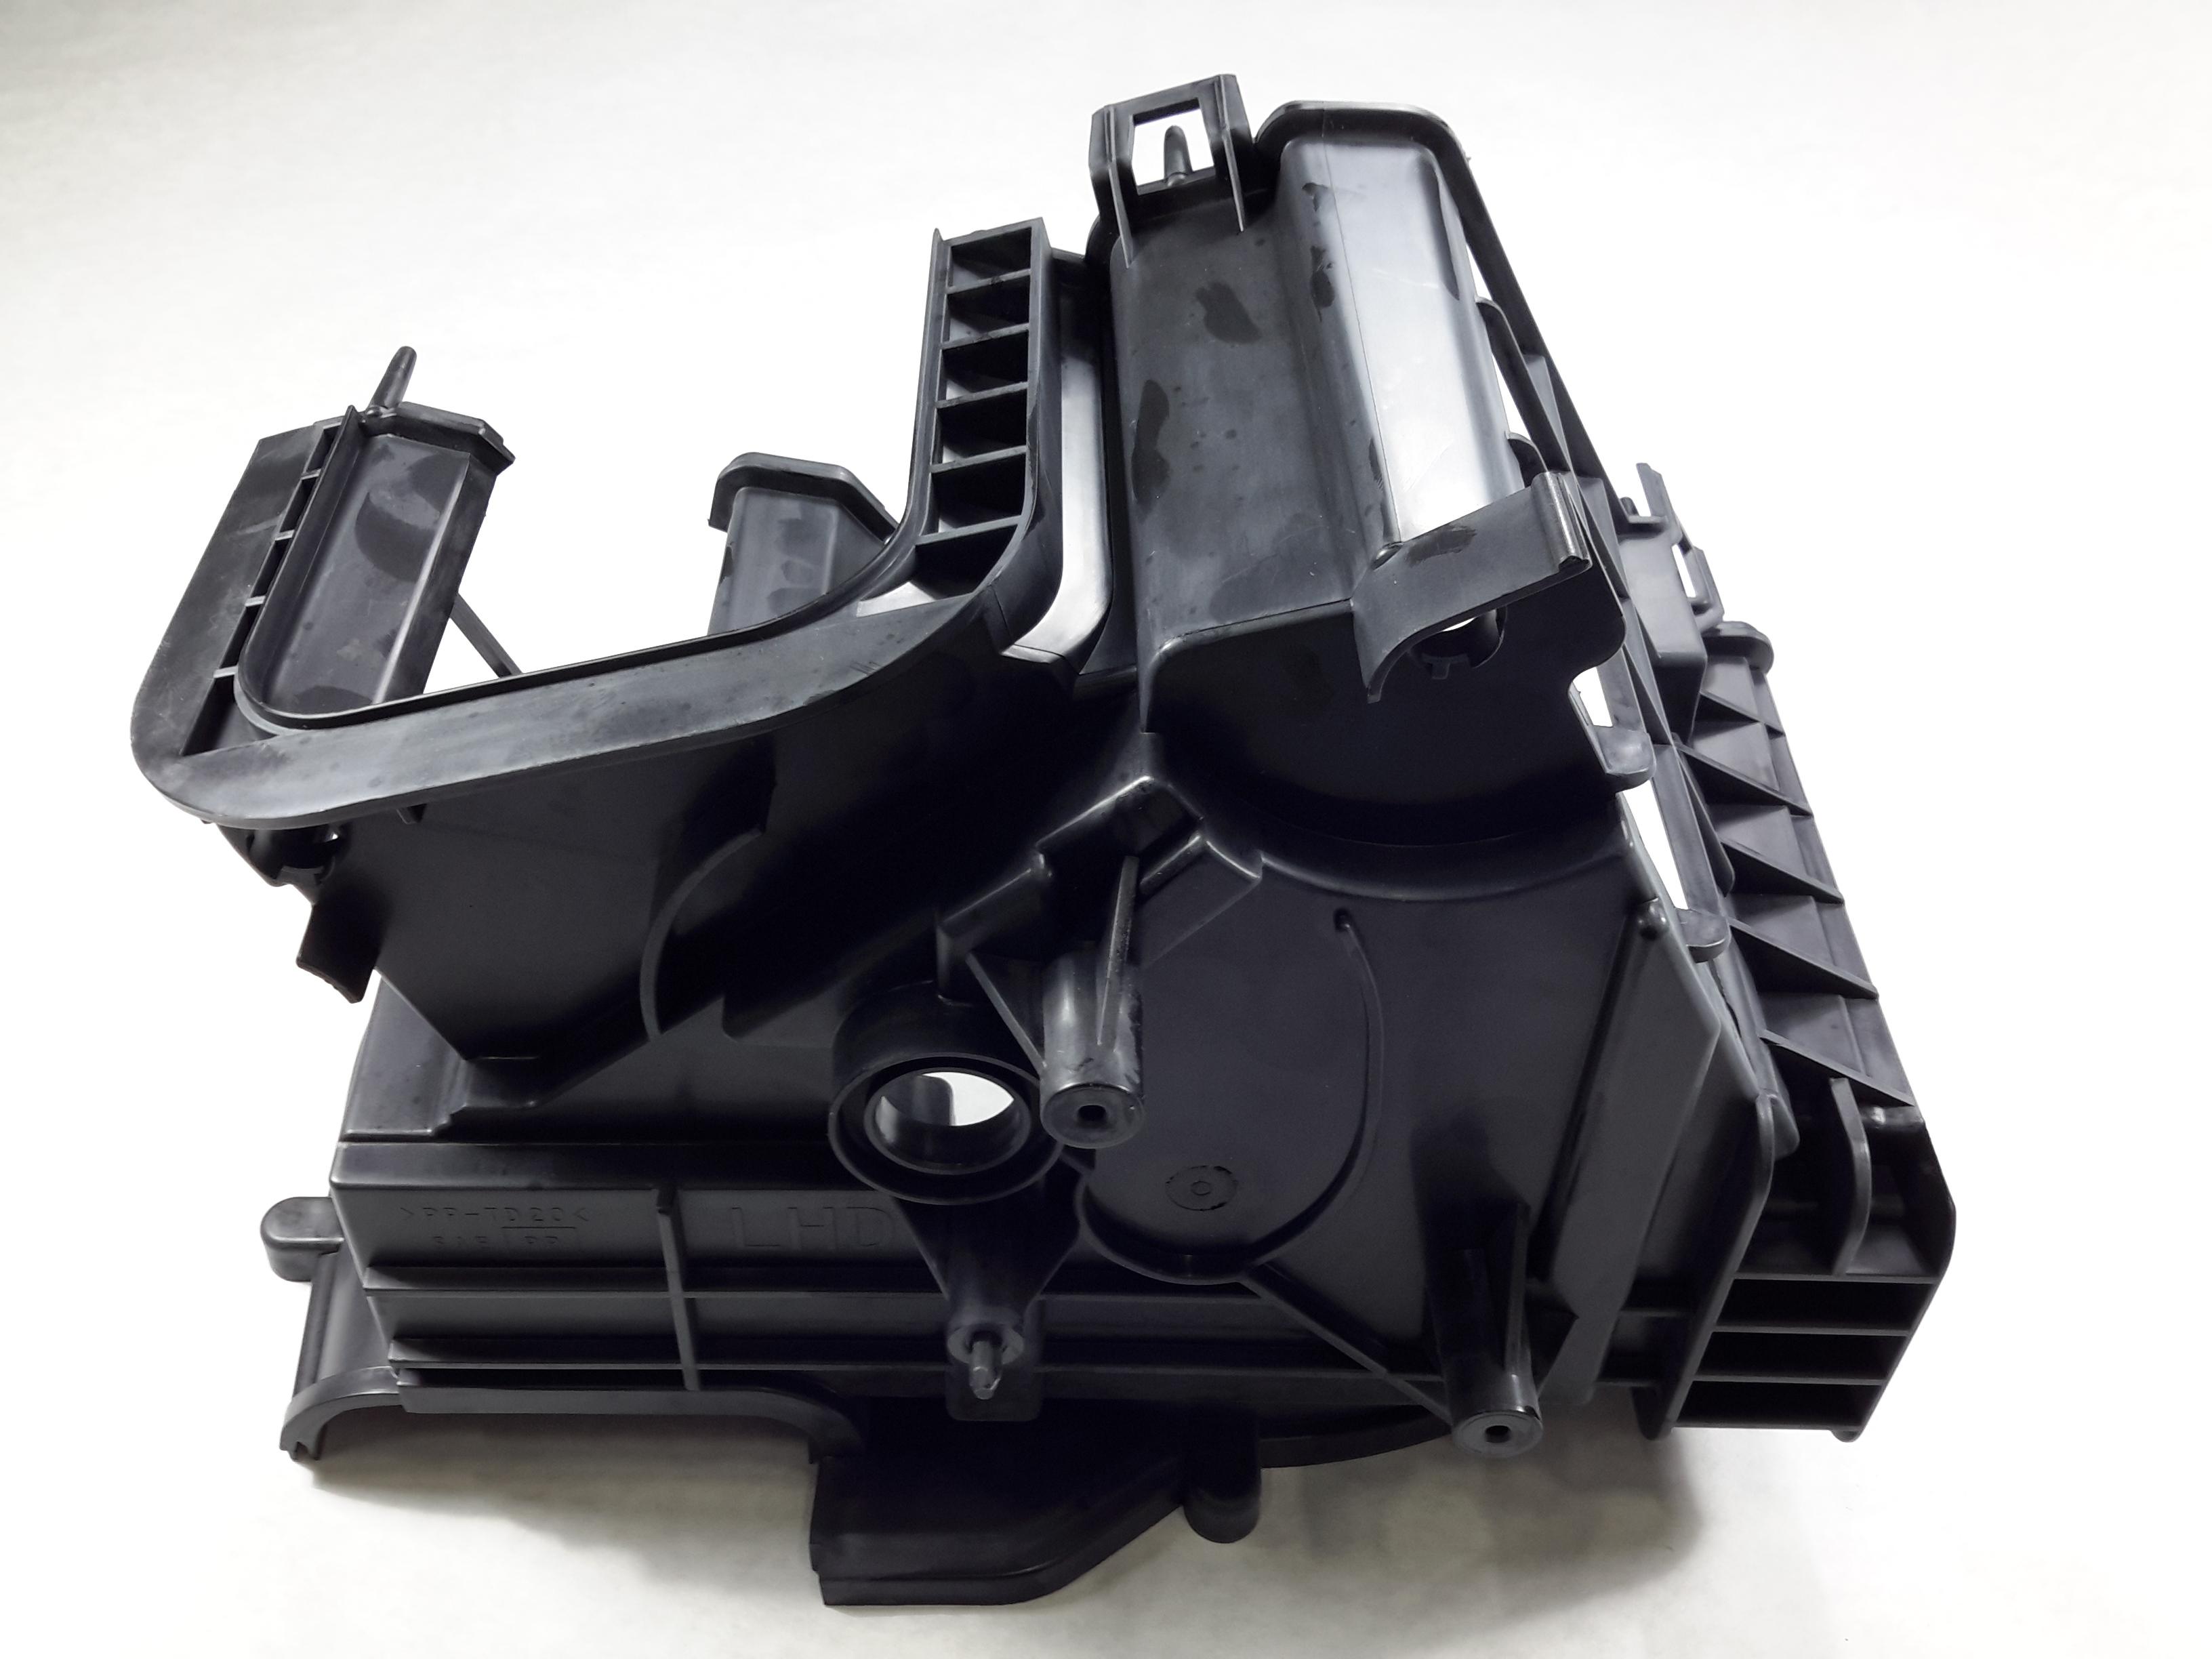 2009 subaru impreza case blower intake right system for 2008 subaru impreza blower motor